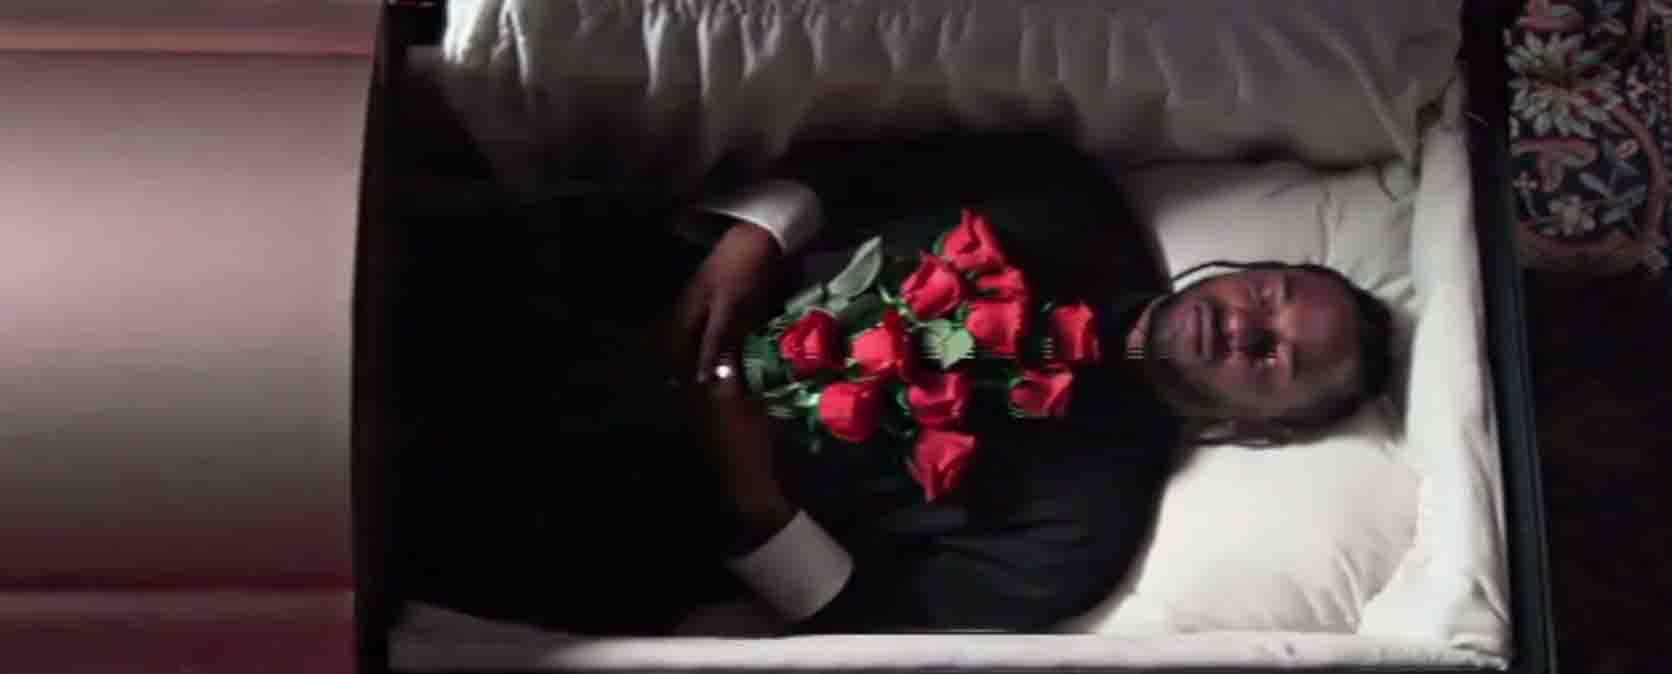 kendrick lamar dna music video